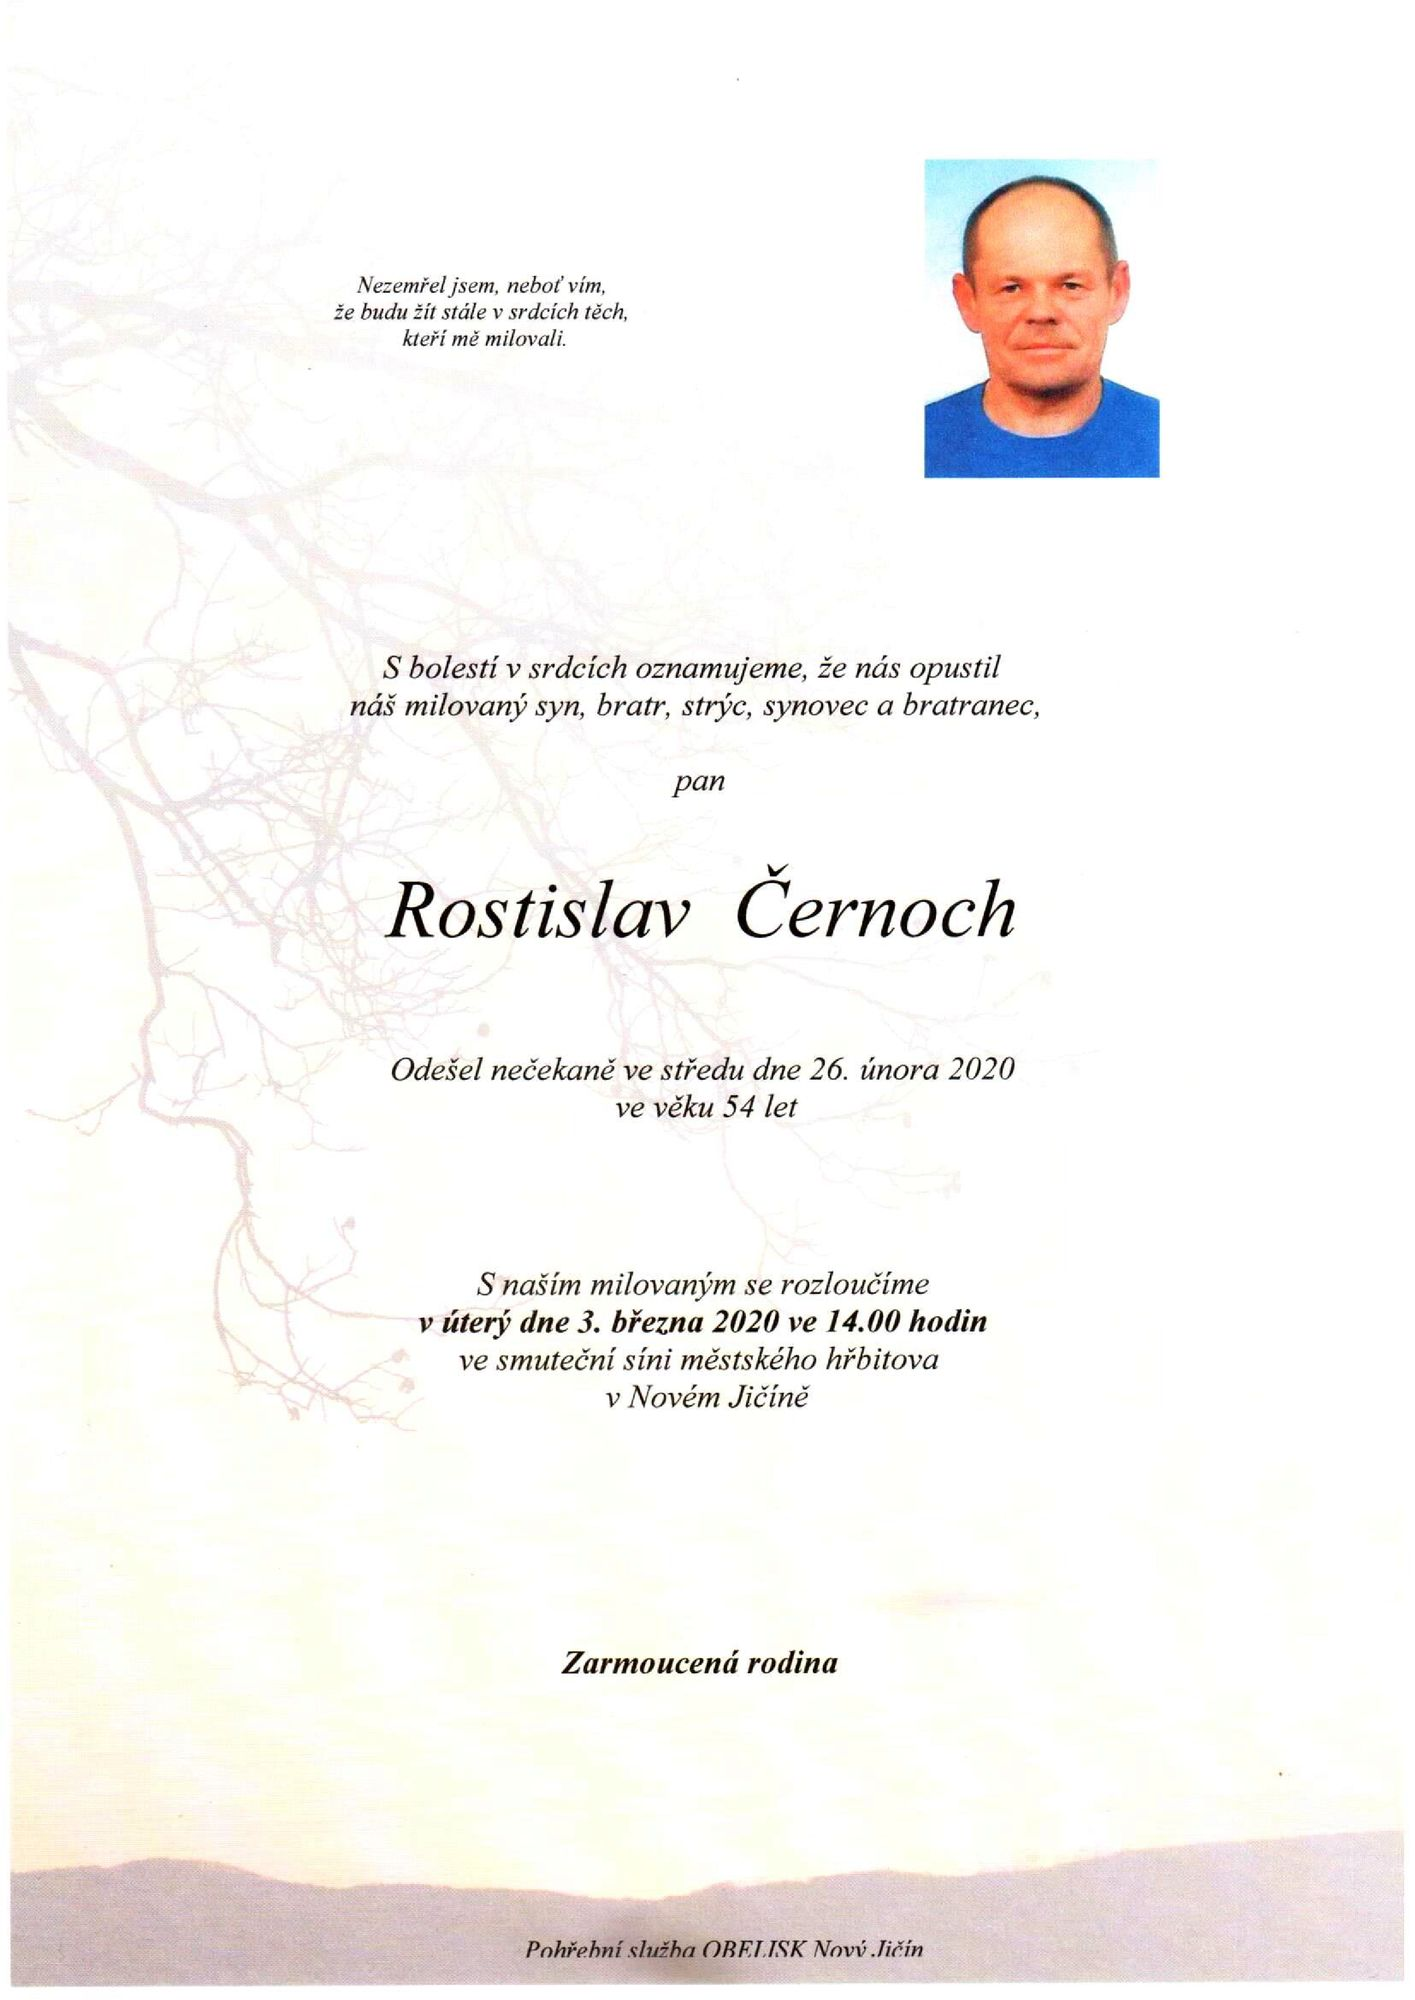 Rostislav Černoch